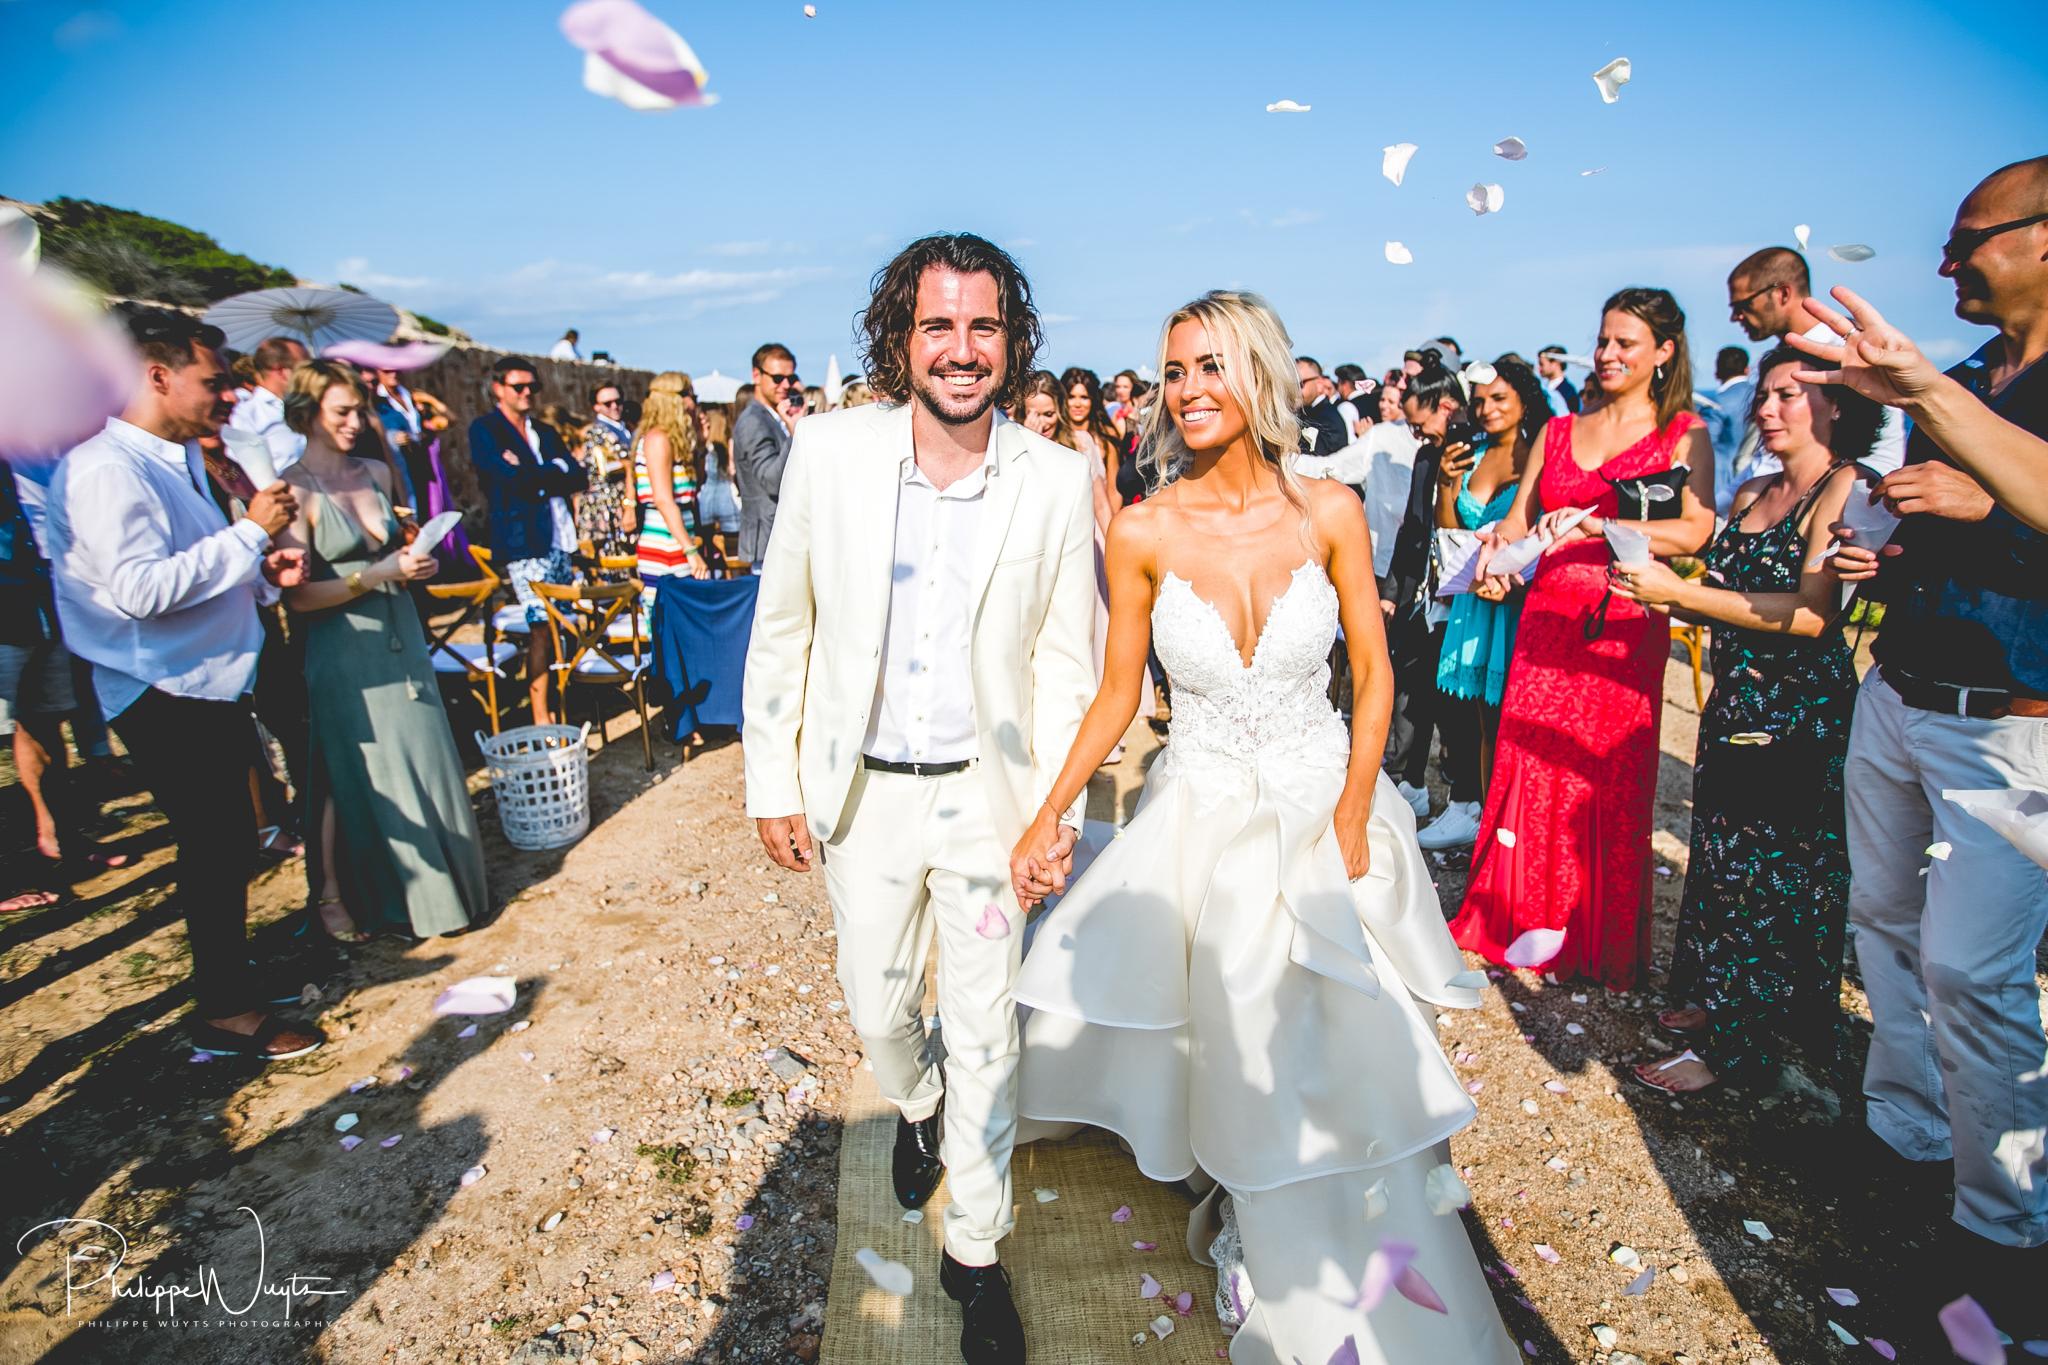 wedding dimitri vegas philippe wuyts